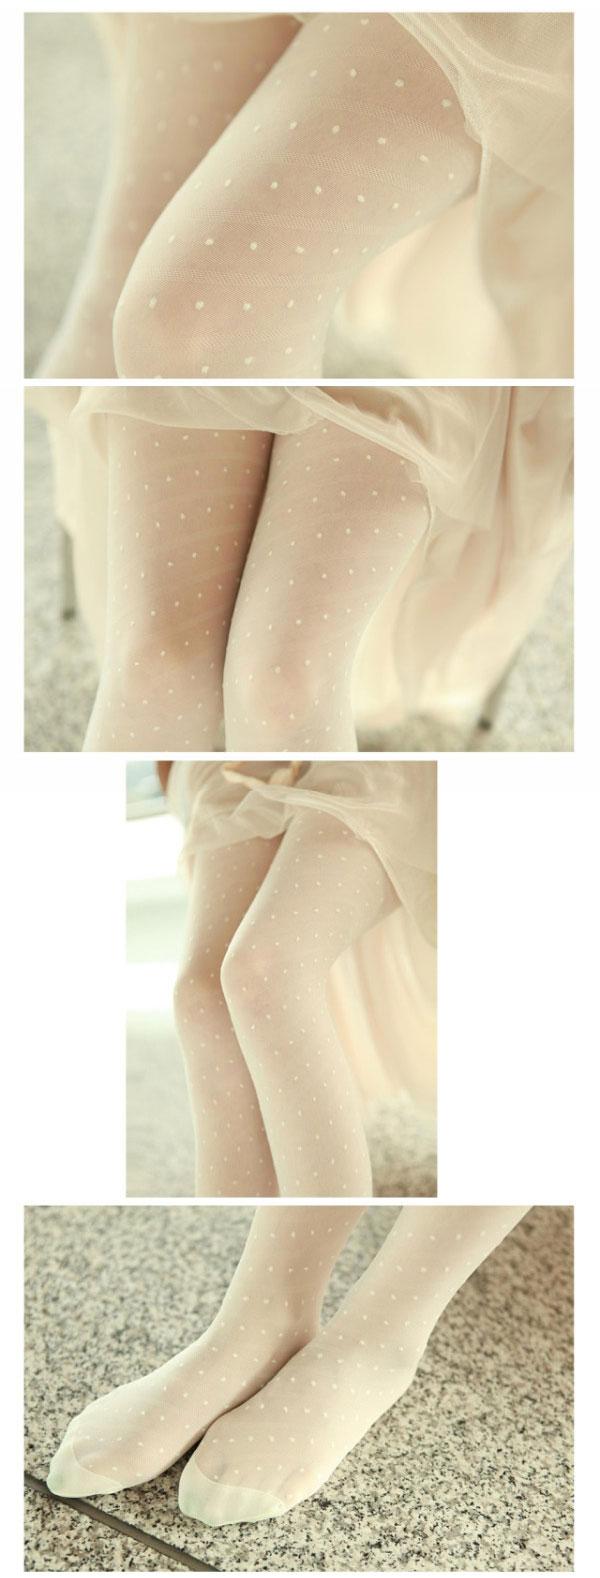 Sexy White Black Tattoo Pantyhose Cute Patterns Sheer Pantyhose Mock Stockings Tights - White Dwill